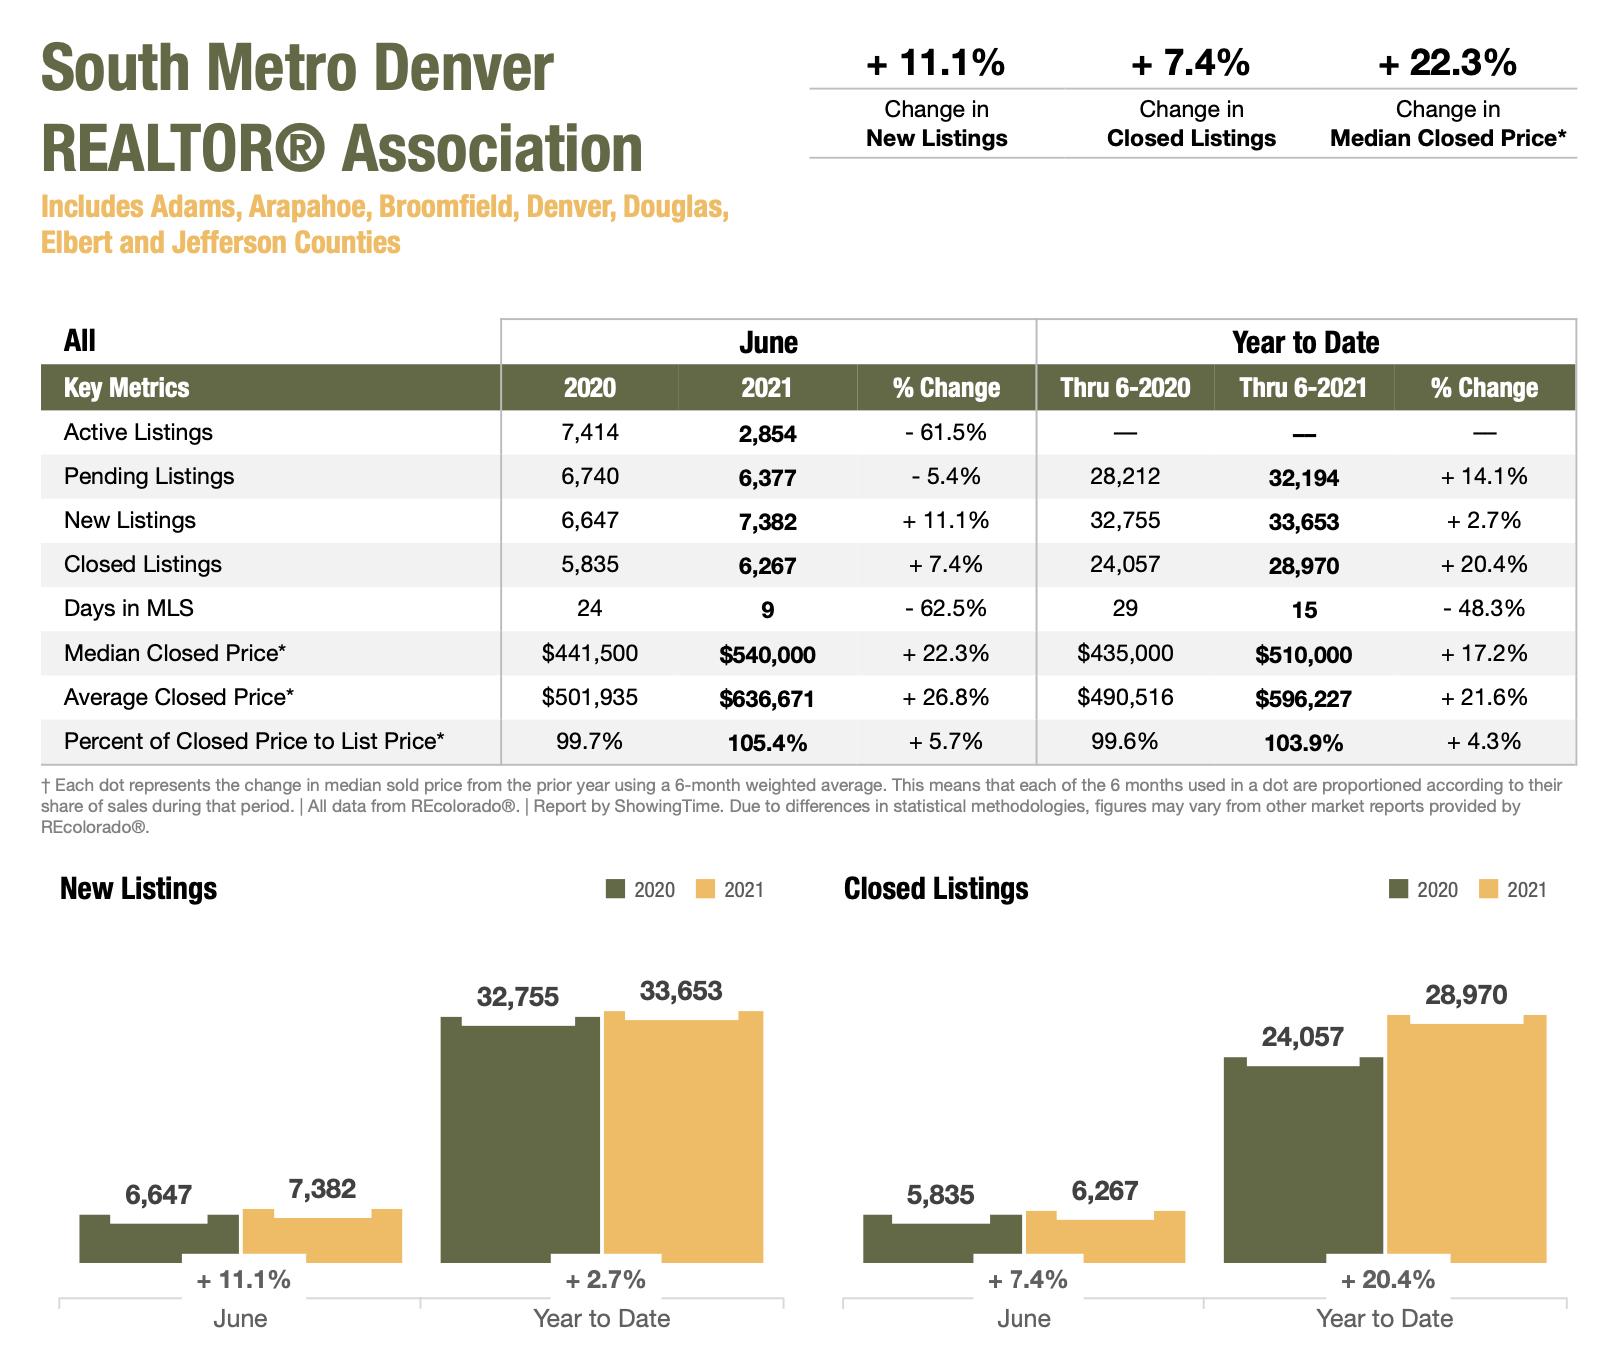 Colorado Real Estate Market Report South Metro Denver REALTOR Association June 2021